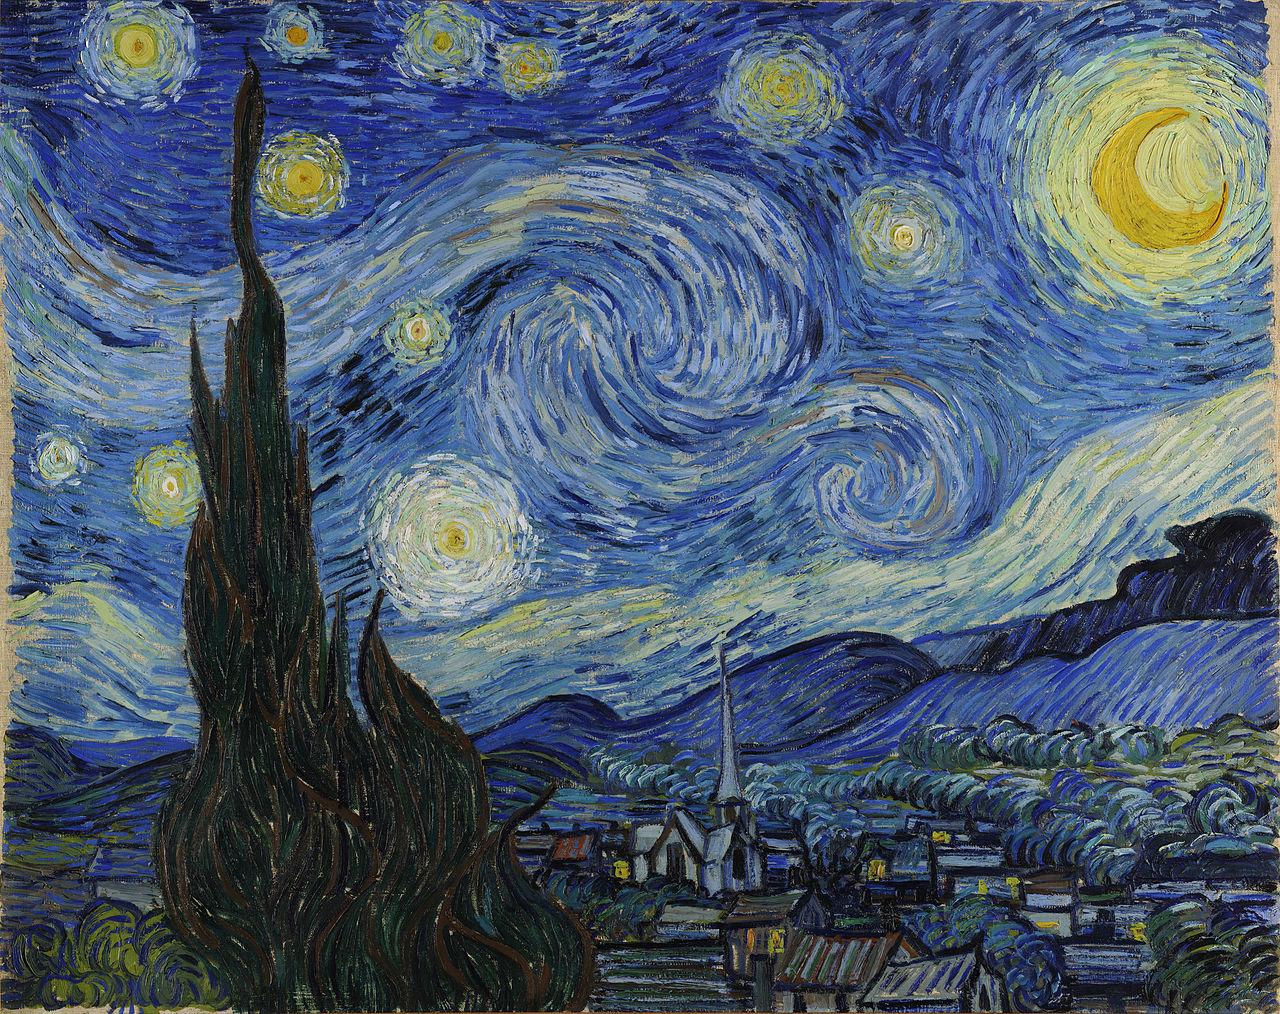 HQ Vincent Van Gogh Wallpapers | File 598.96Kb